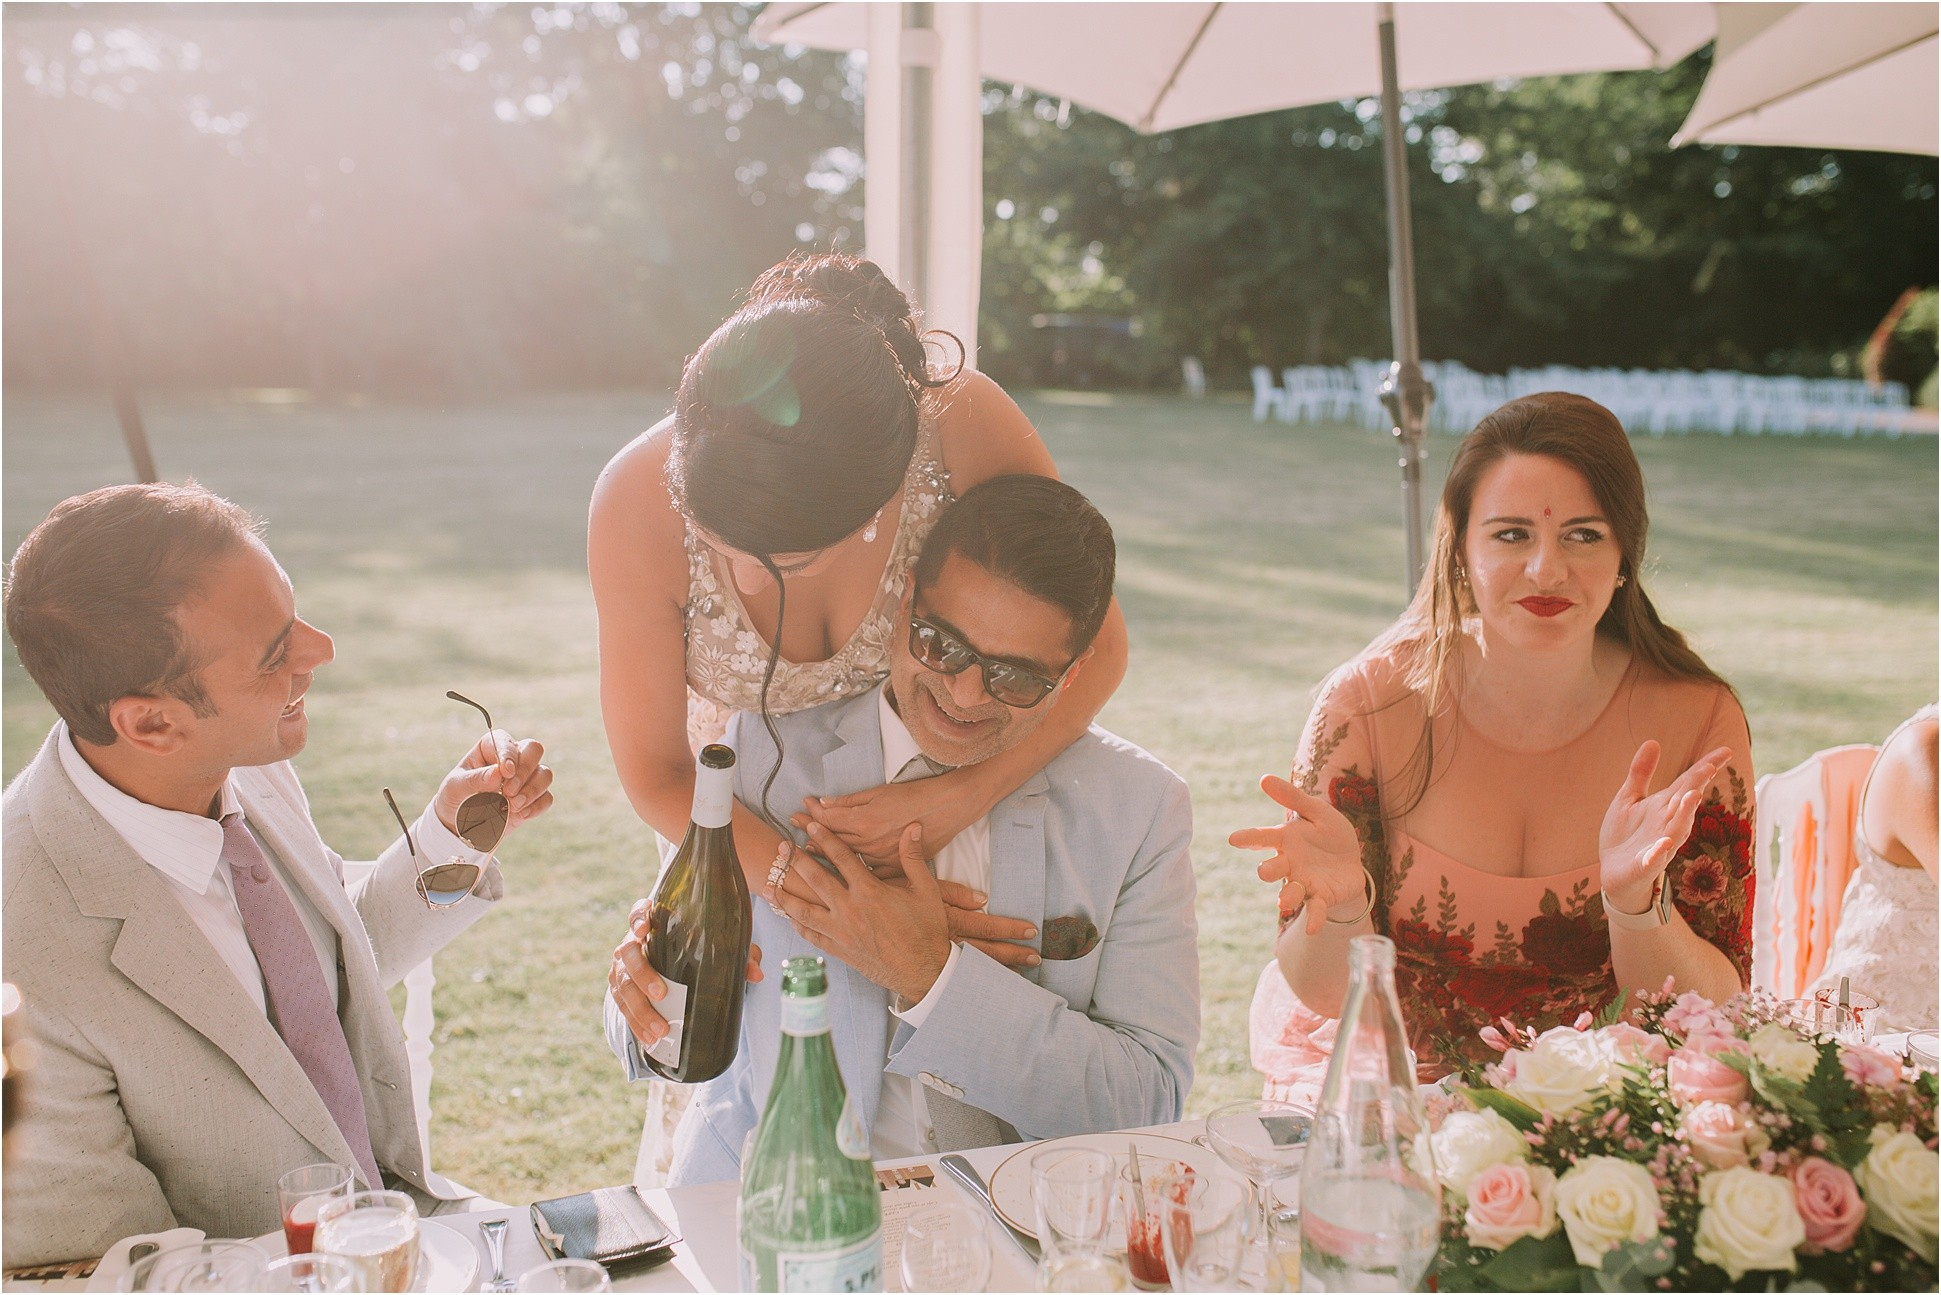 Kateryna-photos-photographe-mariage-chateau-st-paterne-mayenne-normandie_0177.jpg